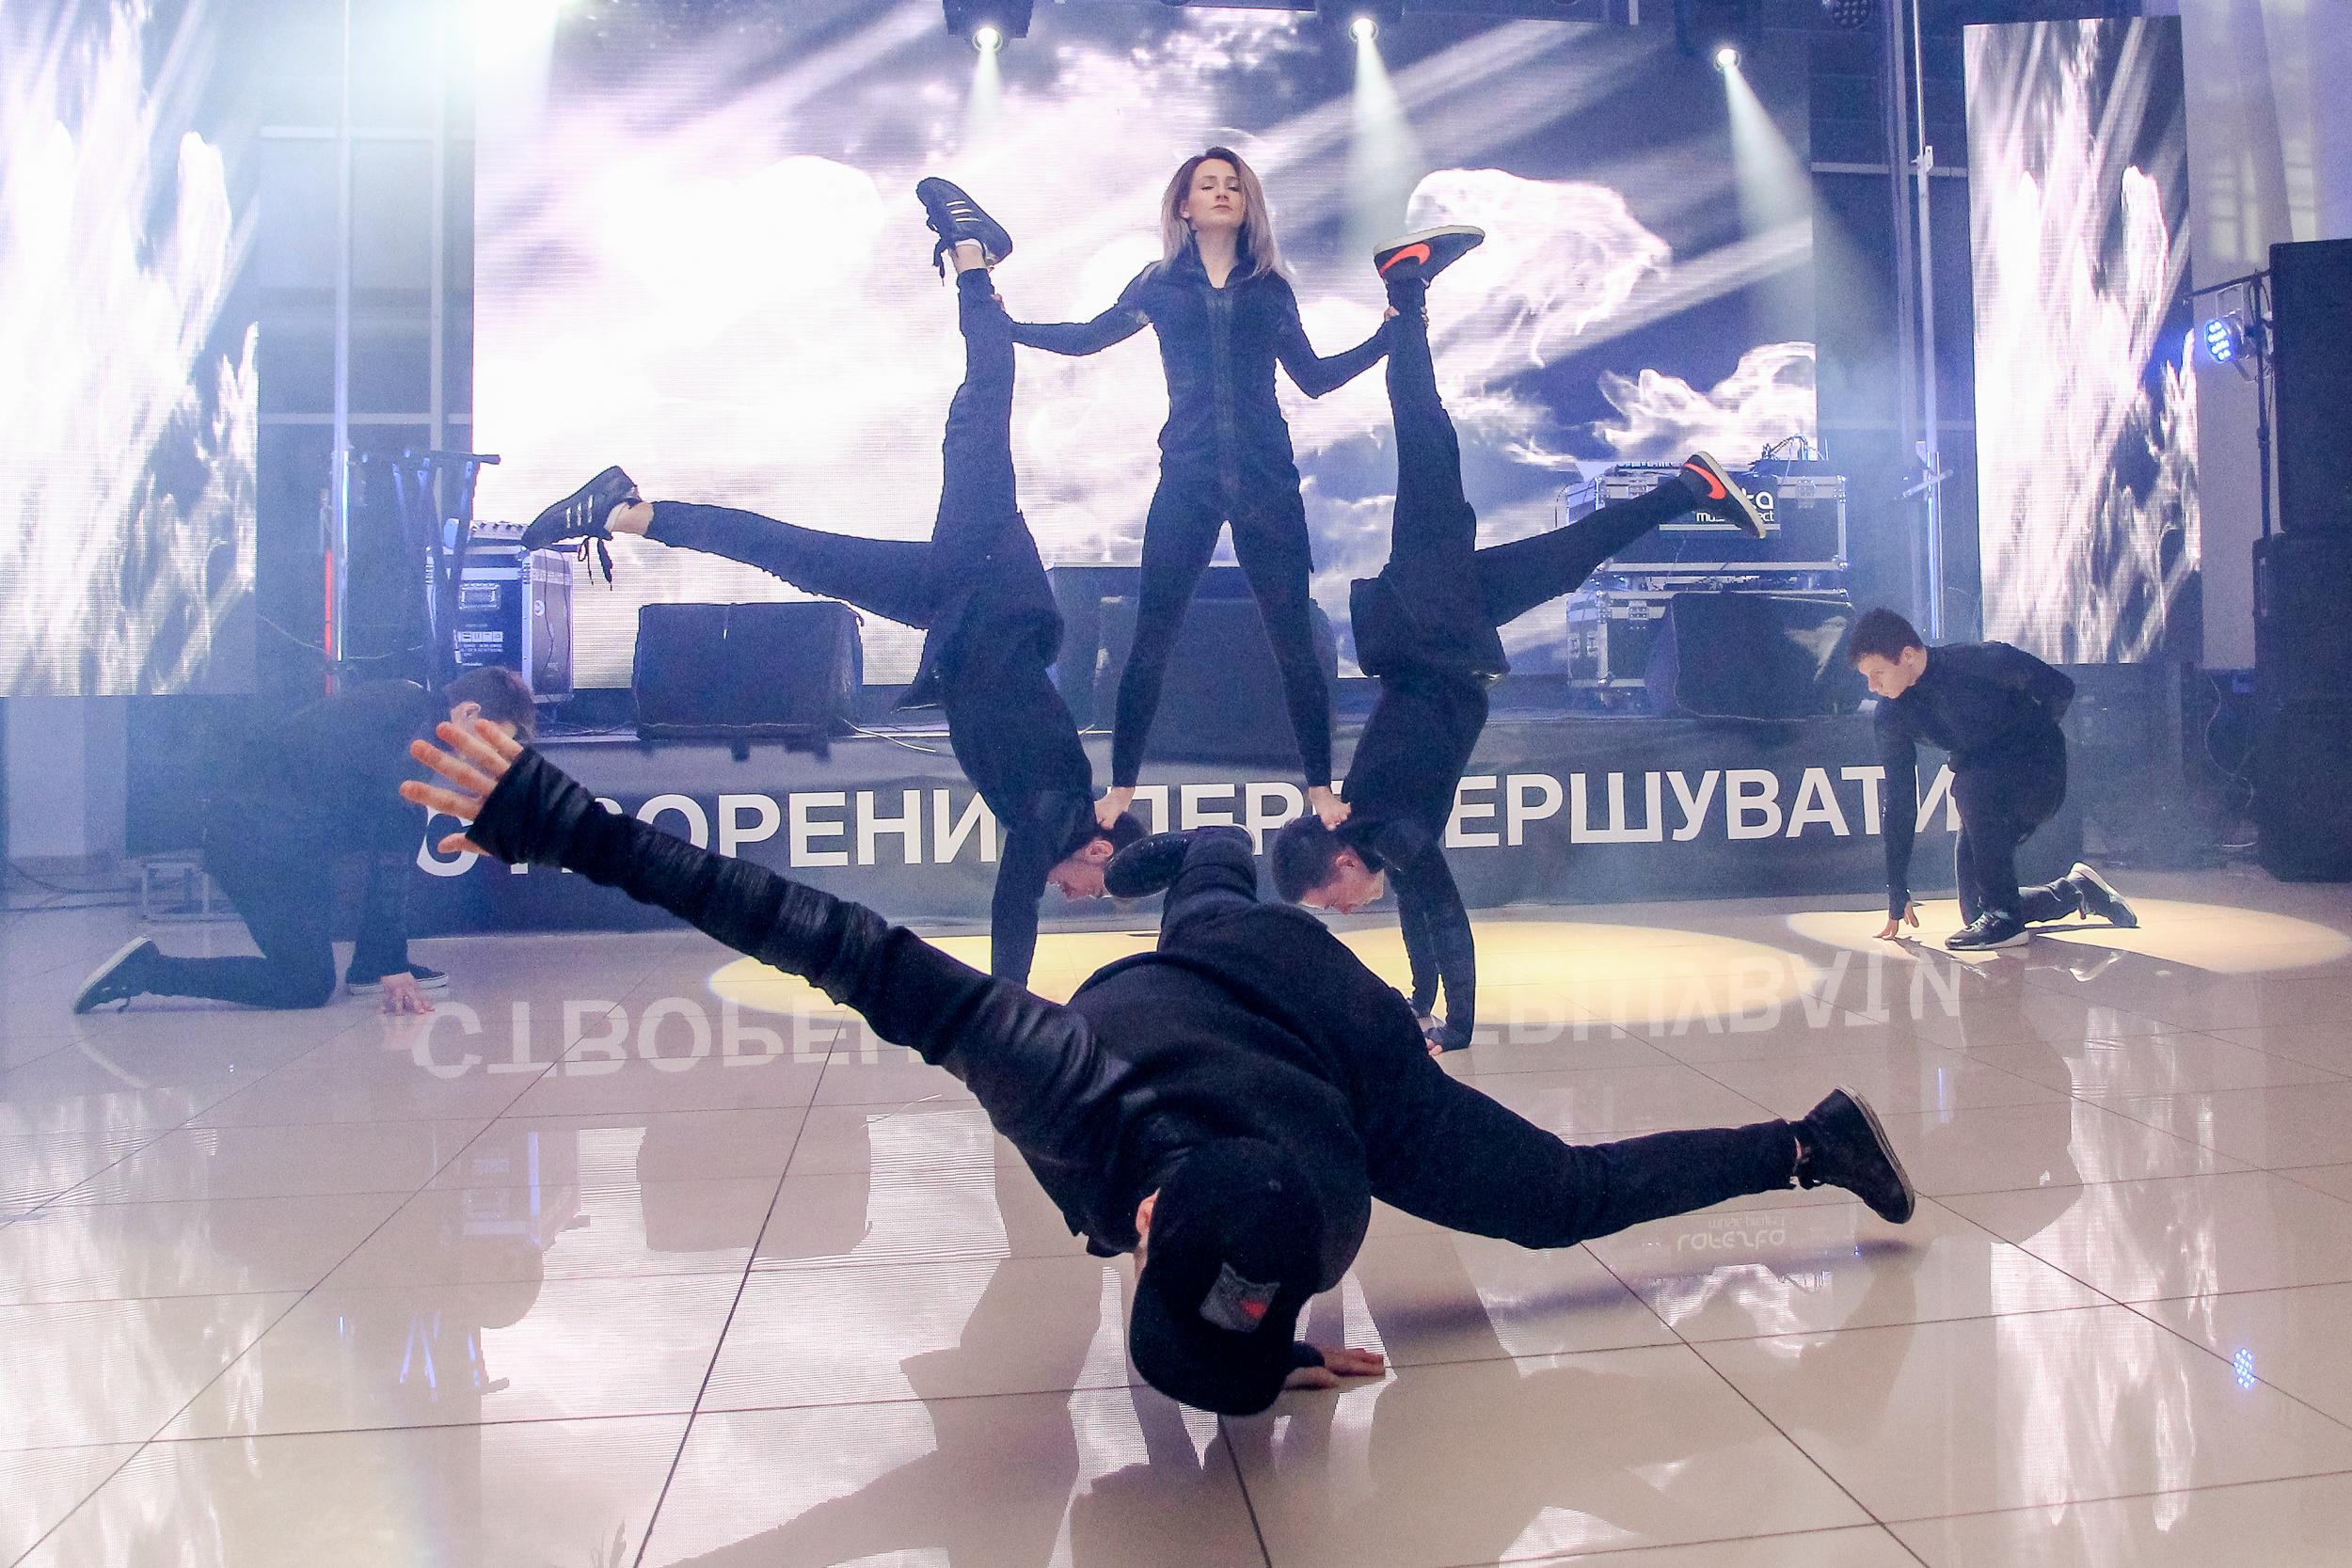 Брейк данс в исполнении танцоров на презентации BMW Николаев